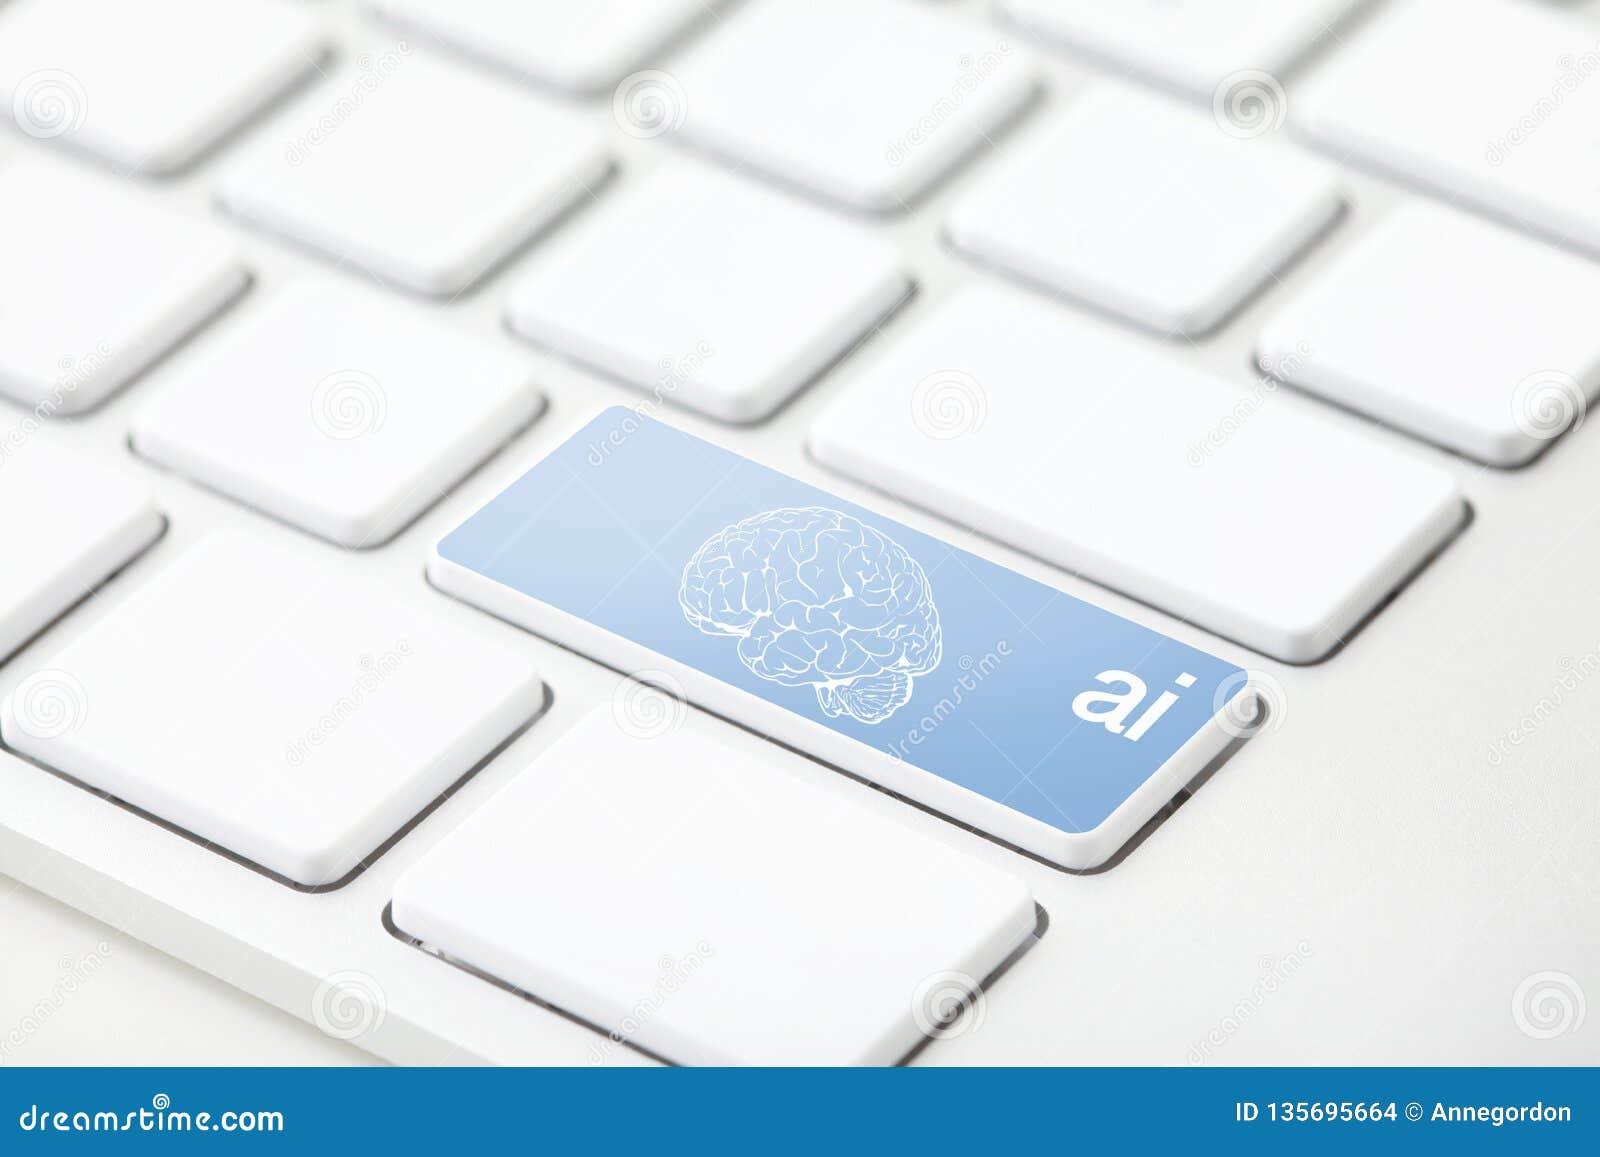 Chiave di intelligenza artificiale